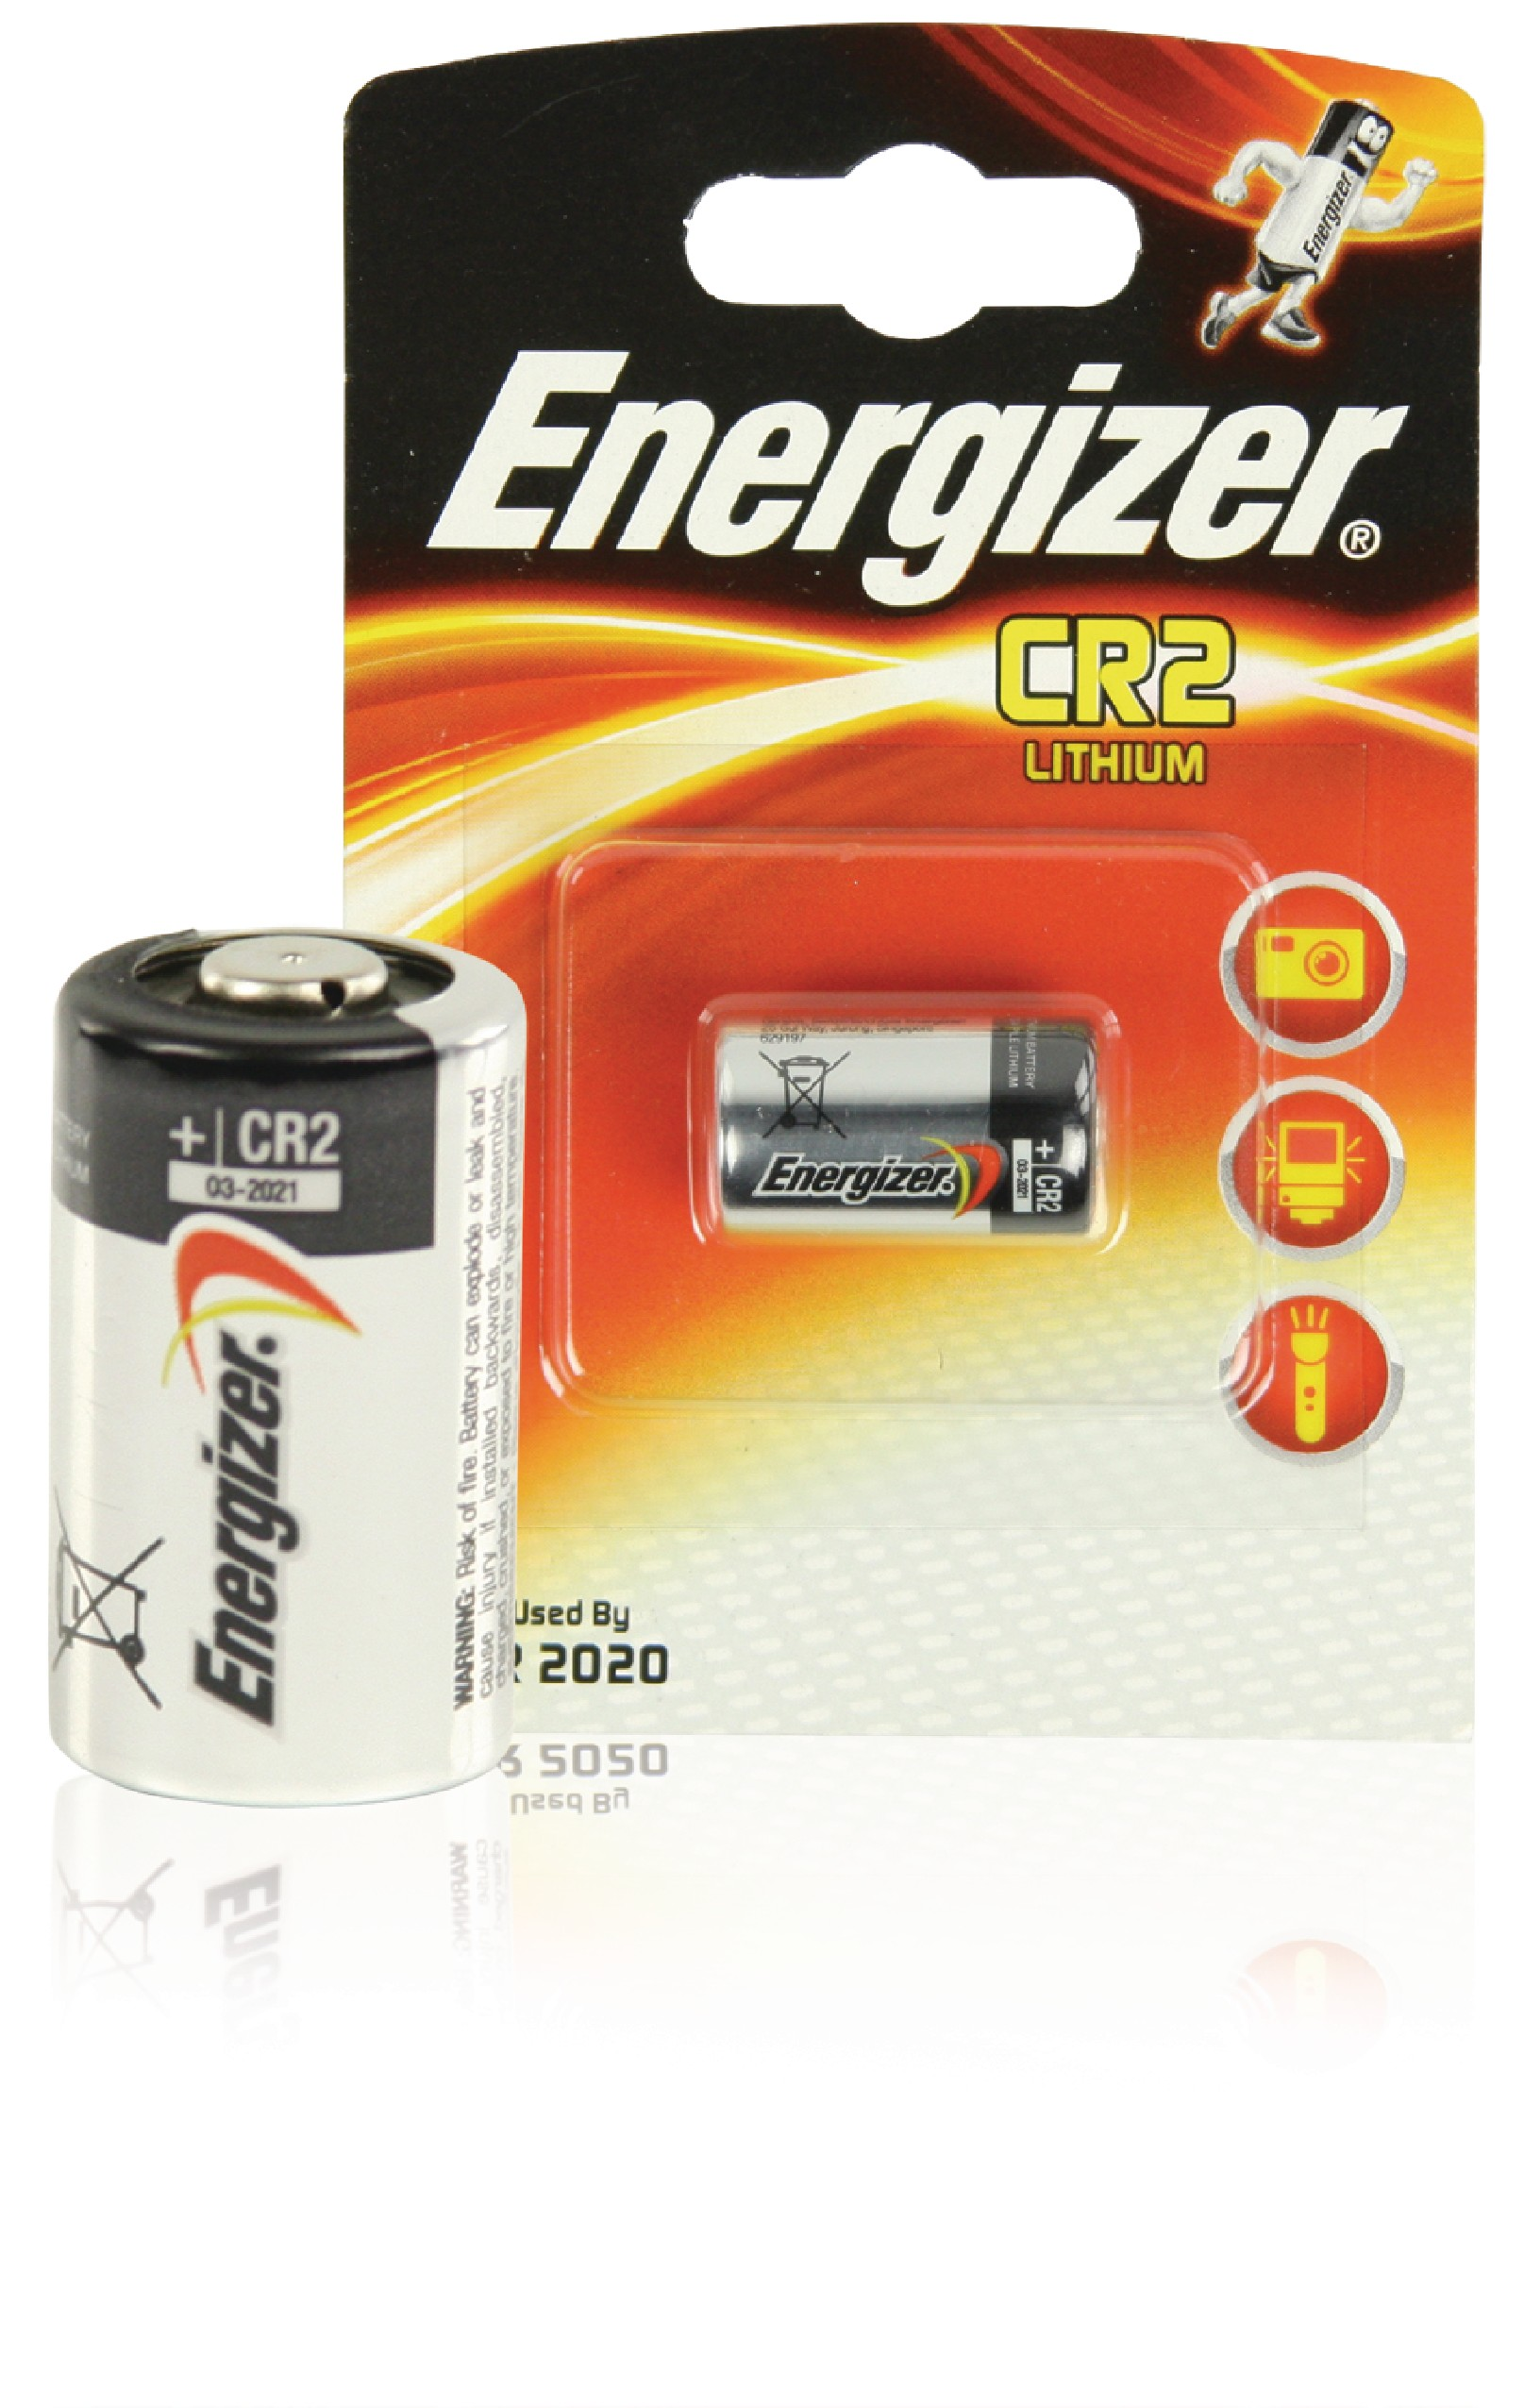 Lithiová baterie Energizer CR2 3 V, 1ks, ENCR2P1